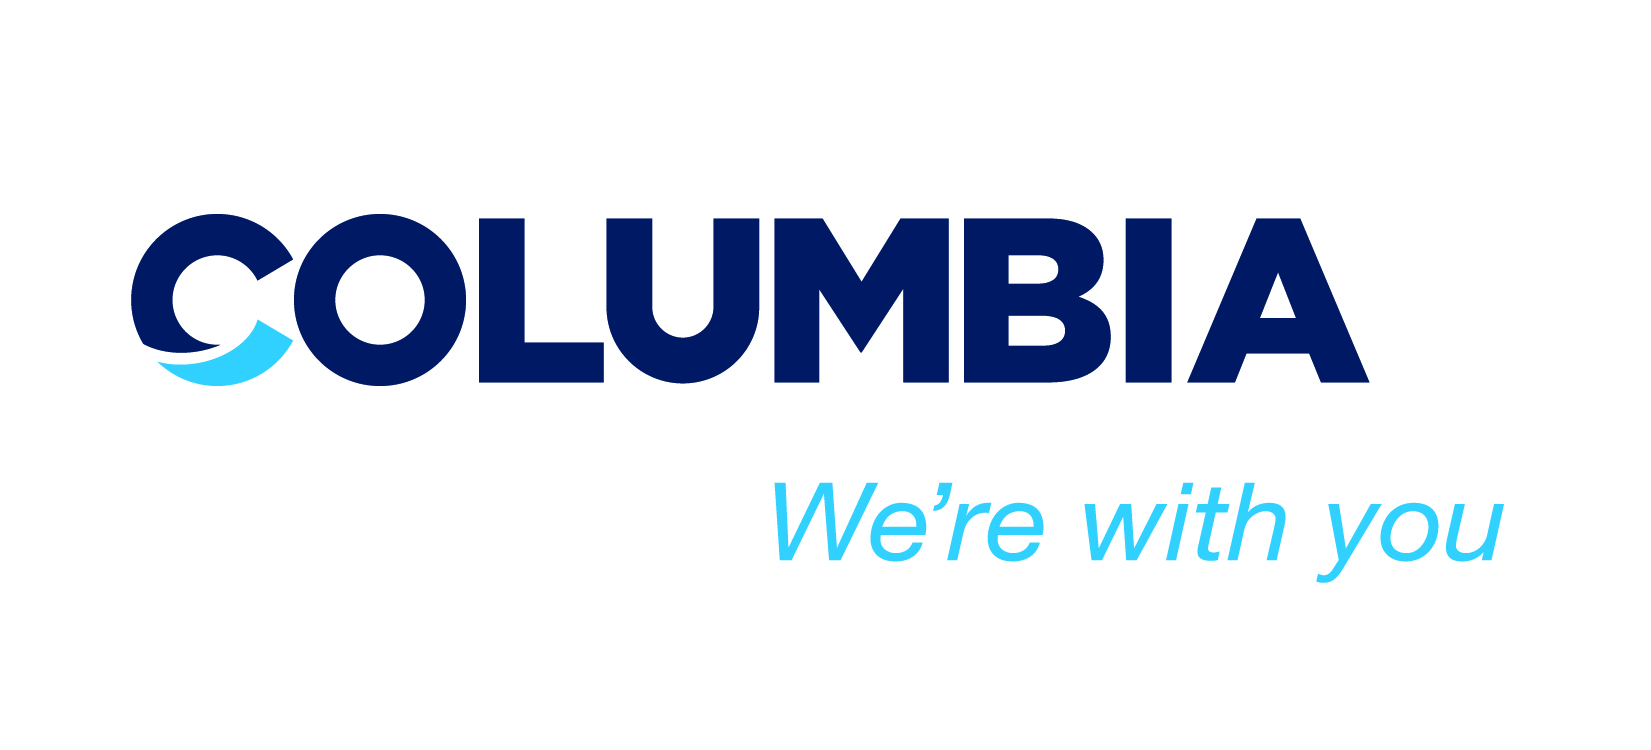 COLUMBIA_LOGO_PMS295+299+TAG